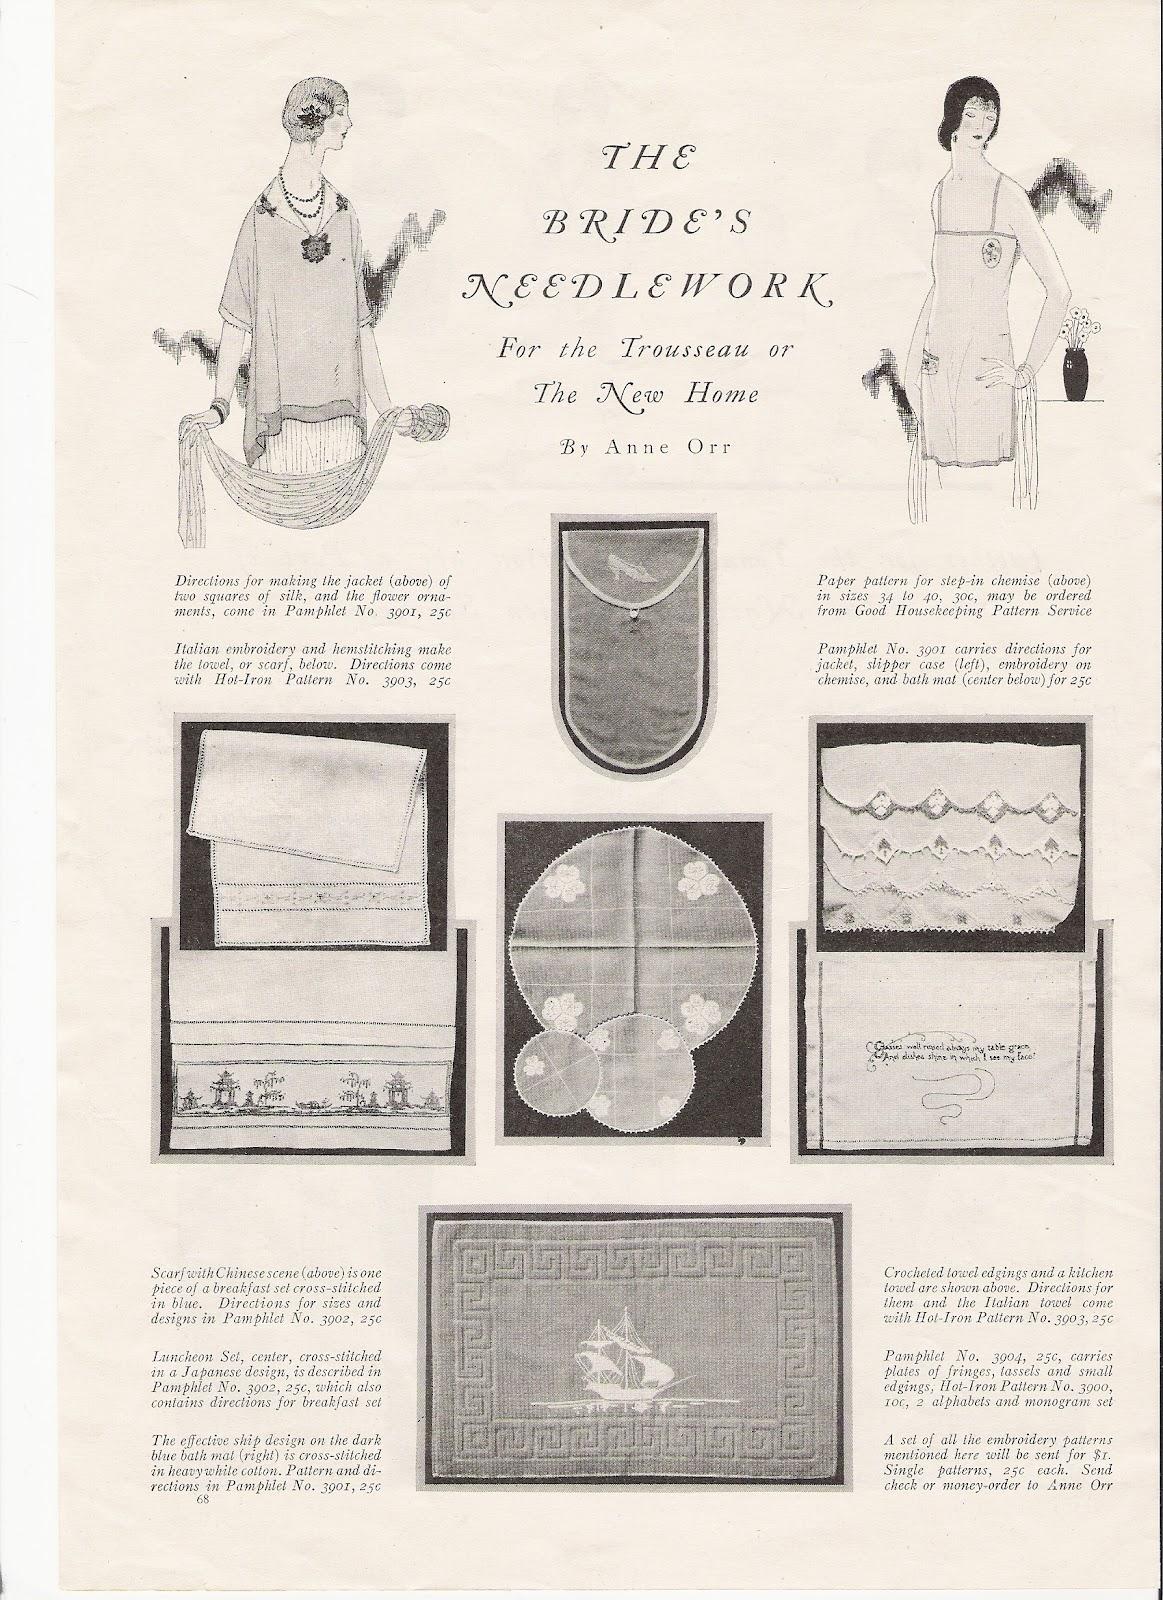 Apron History Good Housekeeping 1924 Fashion Part 2